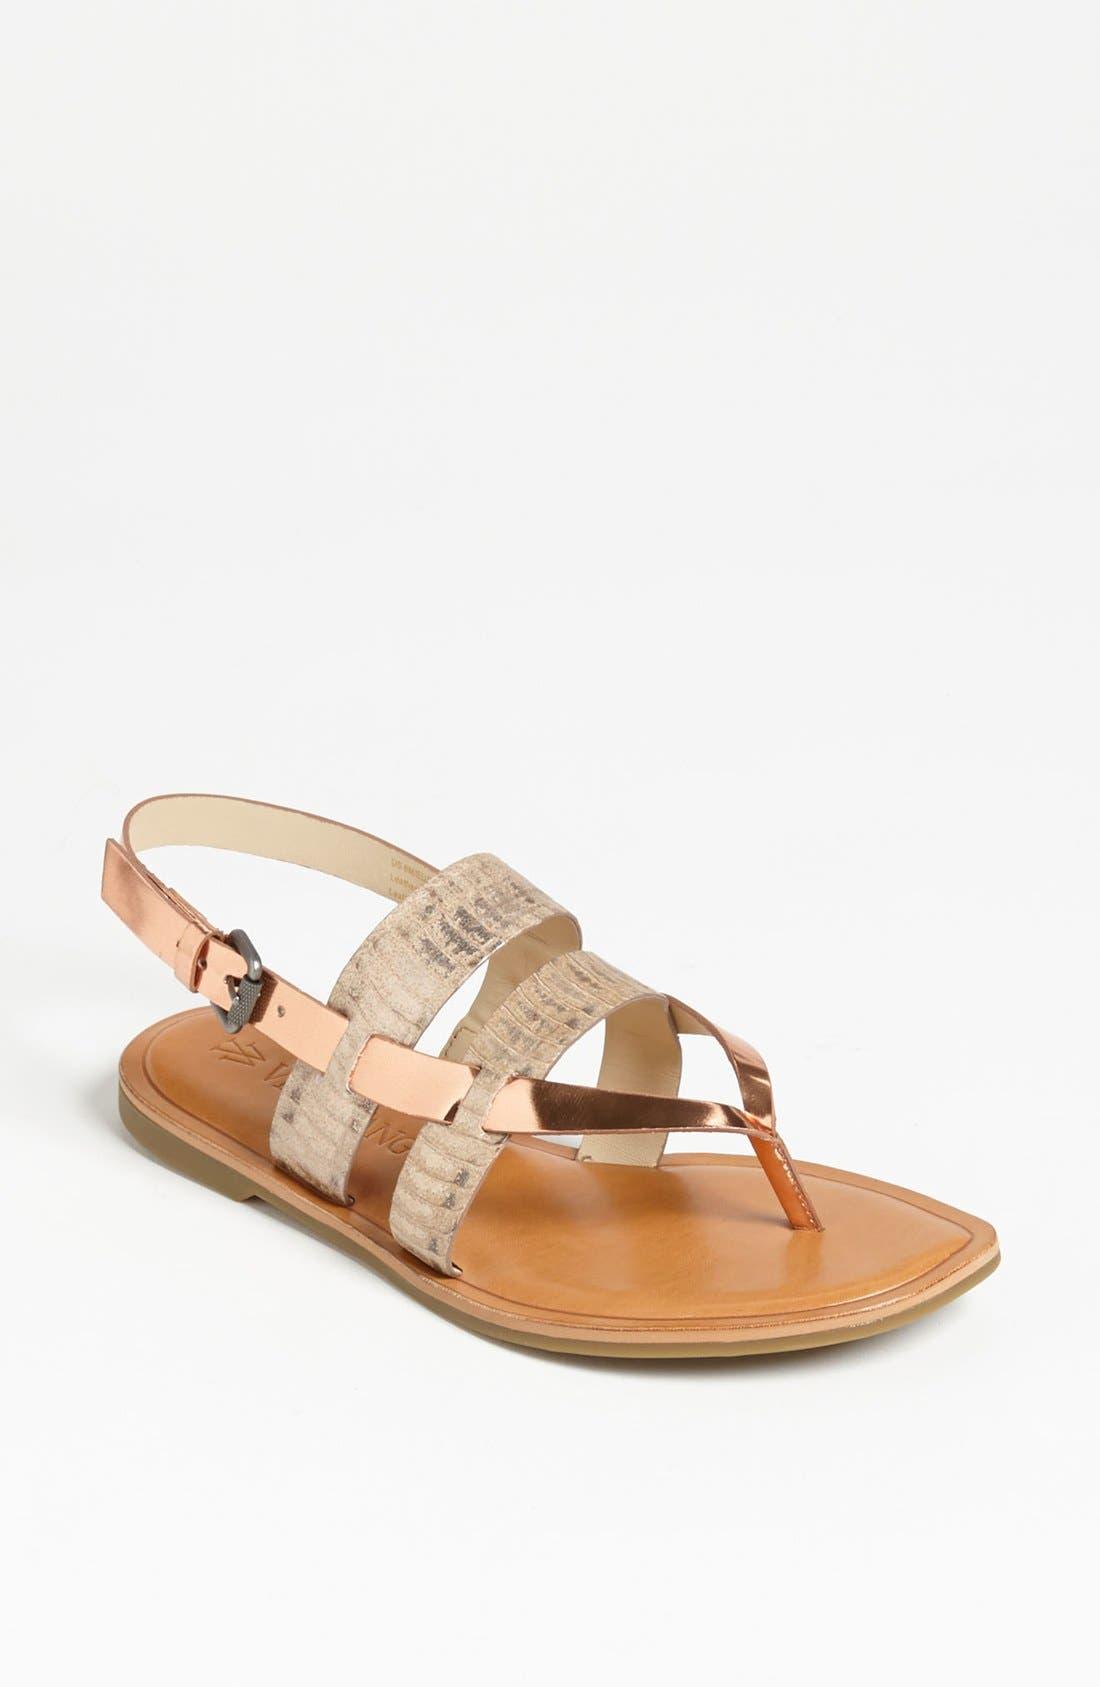 Main Image - Vera Wang Footwear 'Annie' Flat Sandal (Online Only)